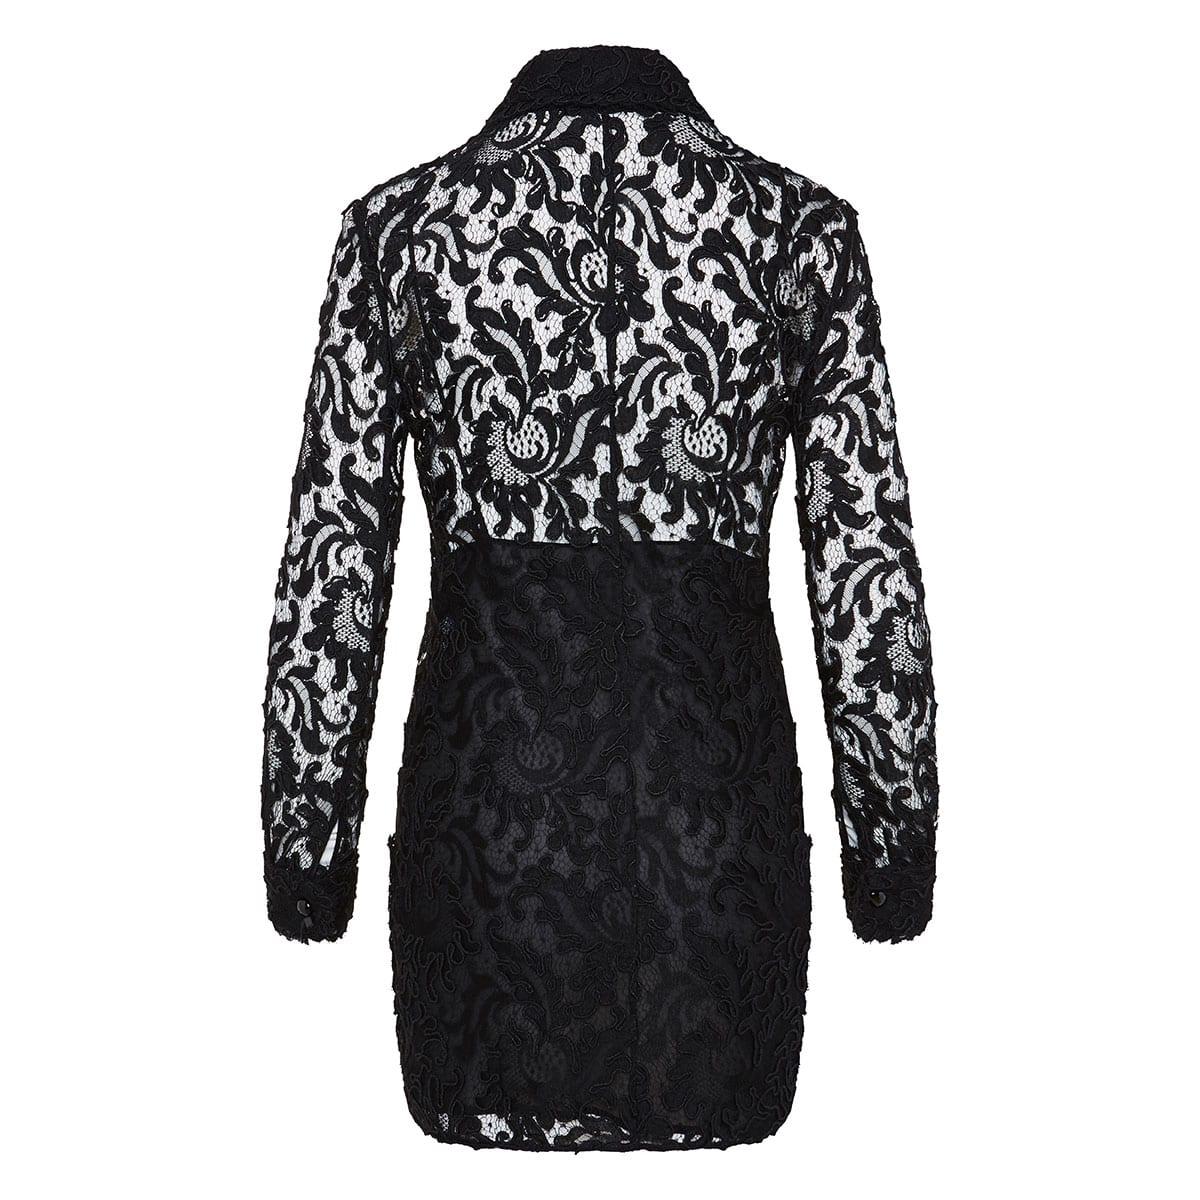 Mini lace shirt dress